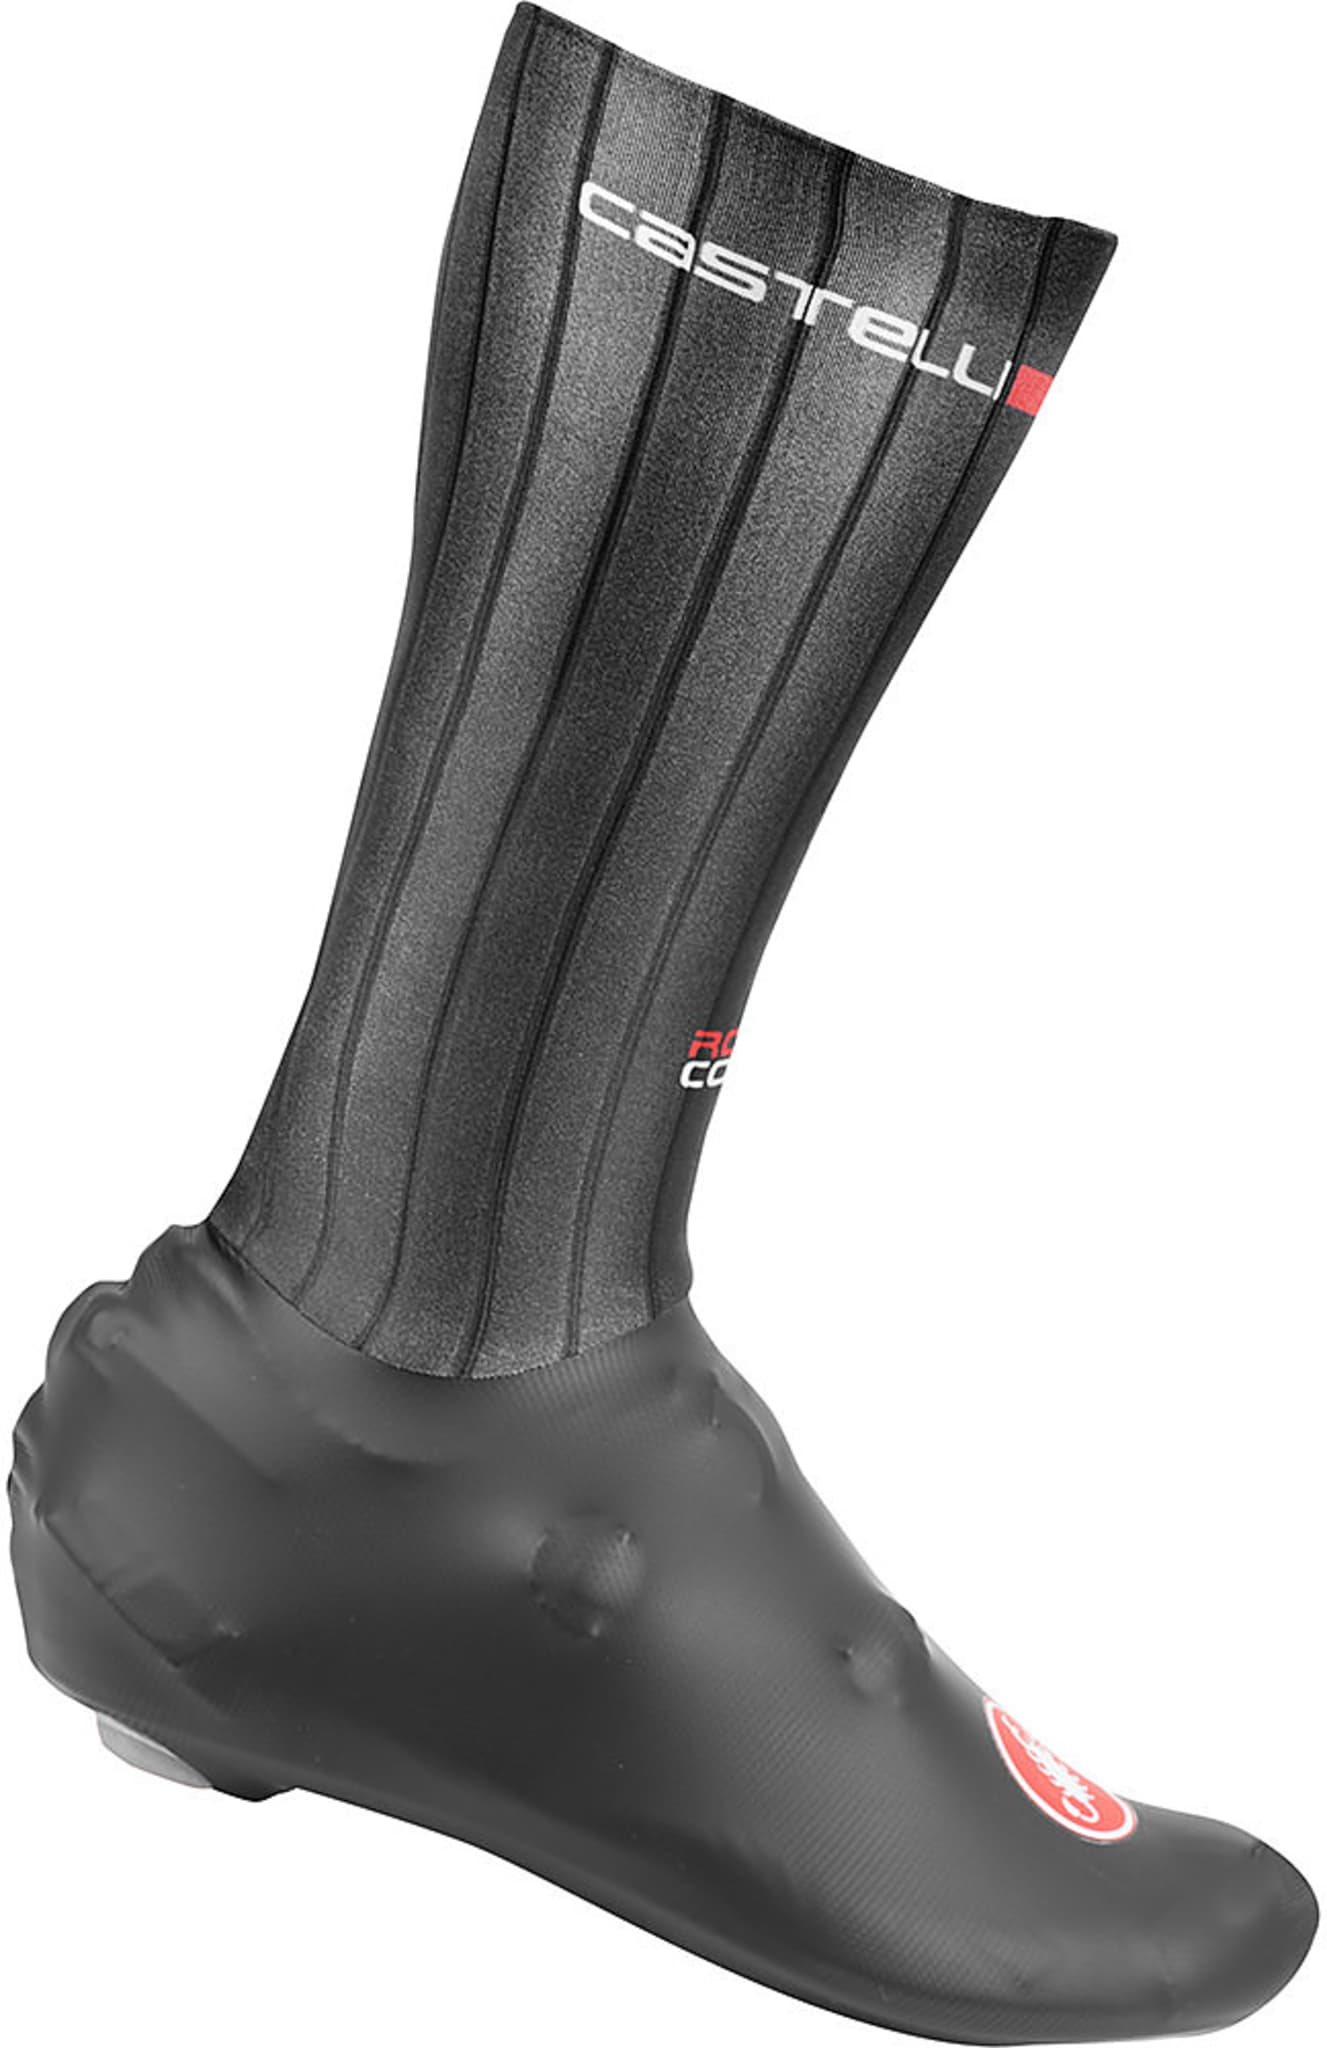 Fast Feet TT Shoecover